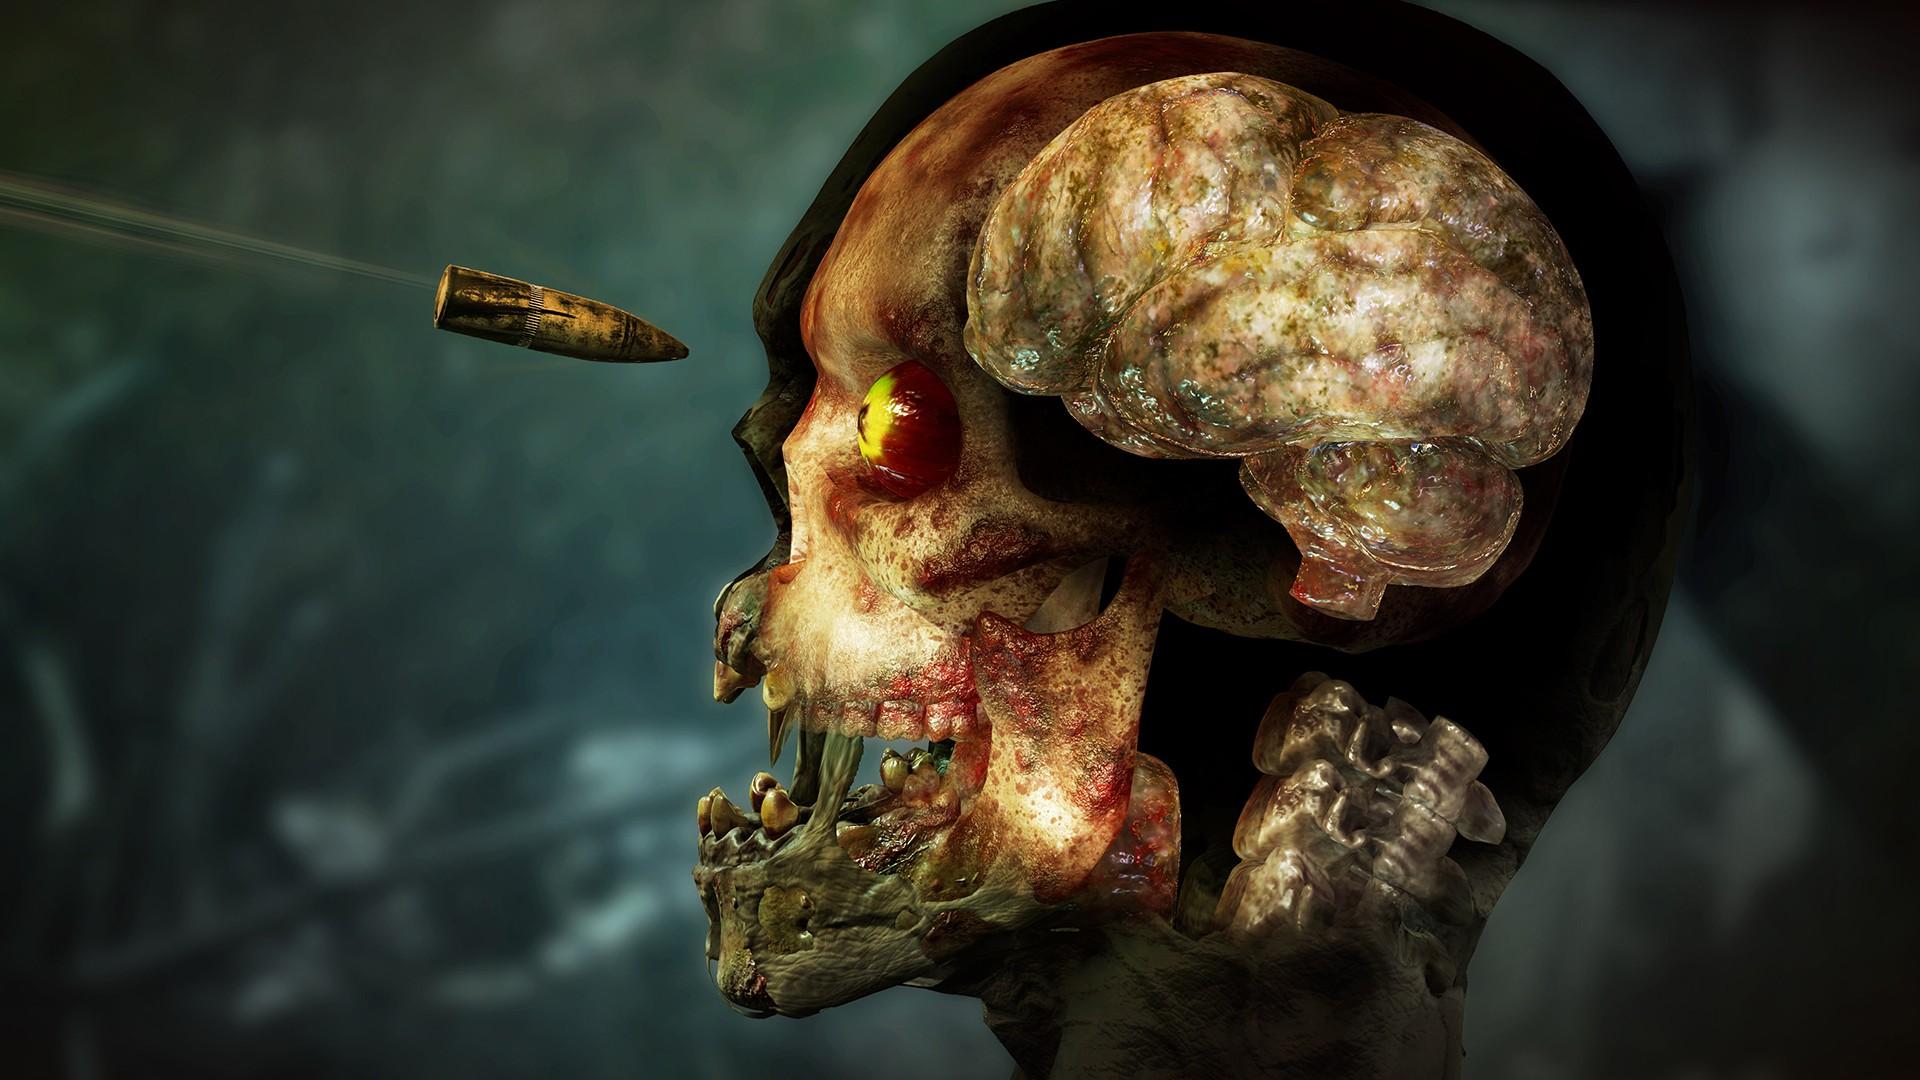 Почти час геймплея Zombie Army 4 в духе Left 4 Dead